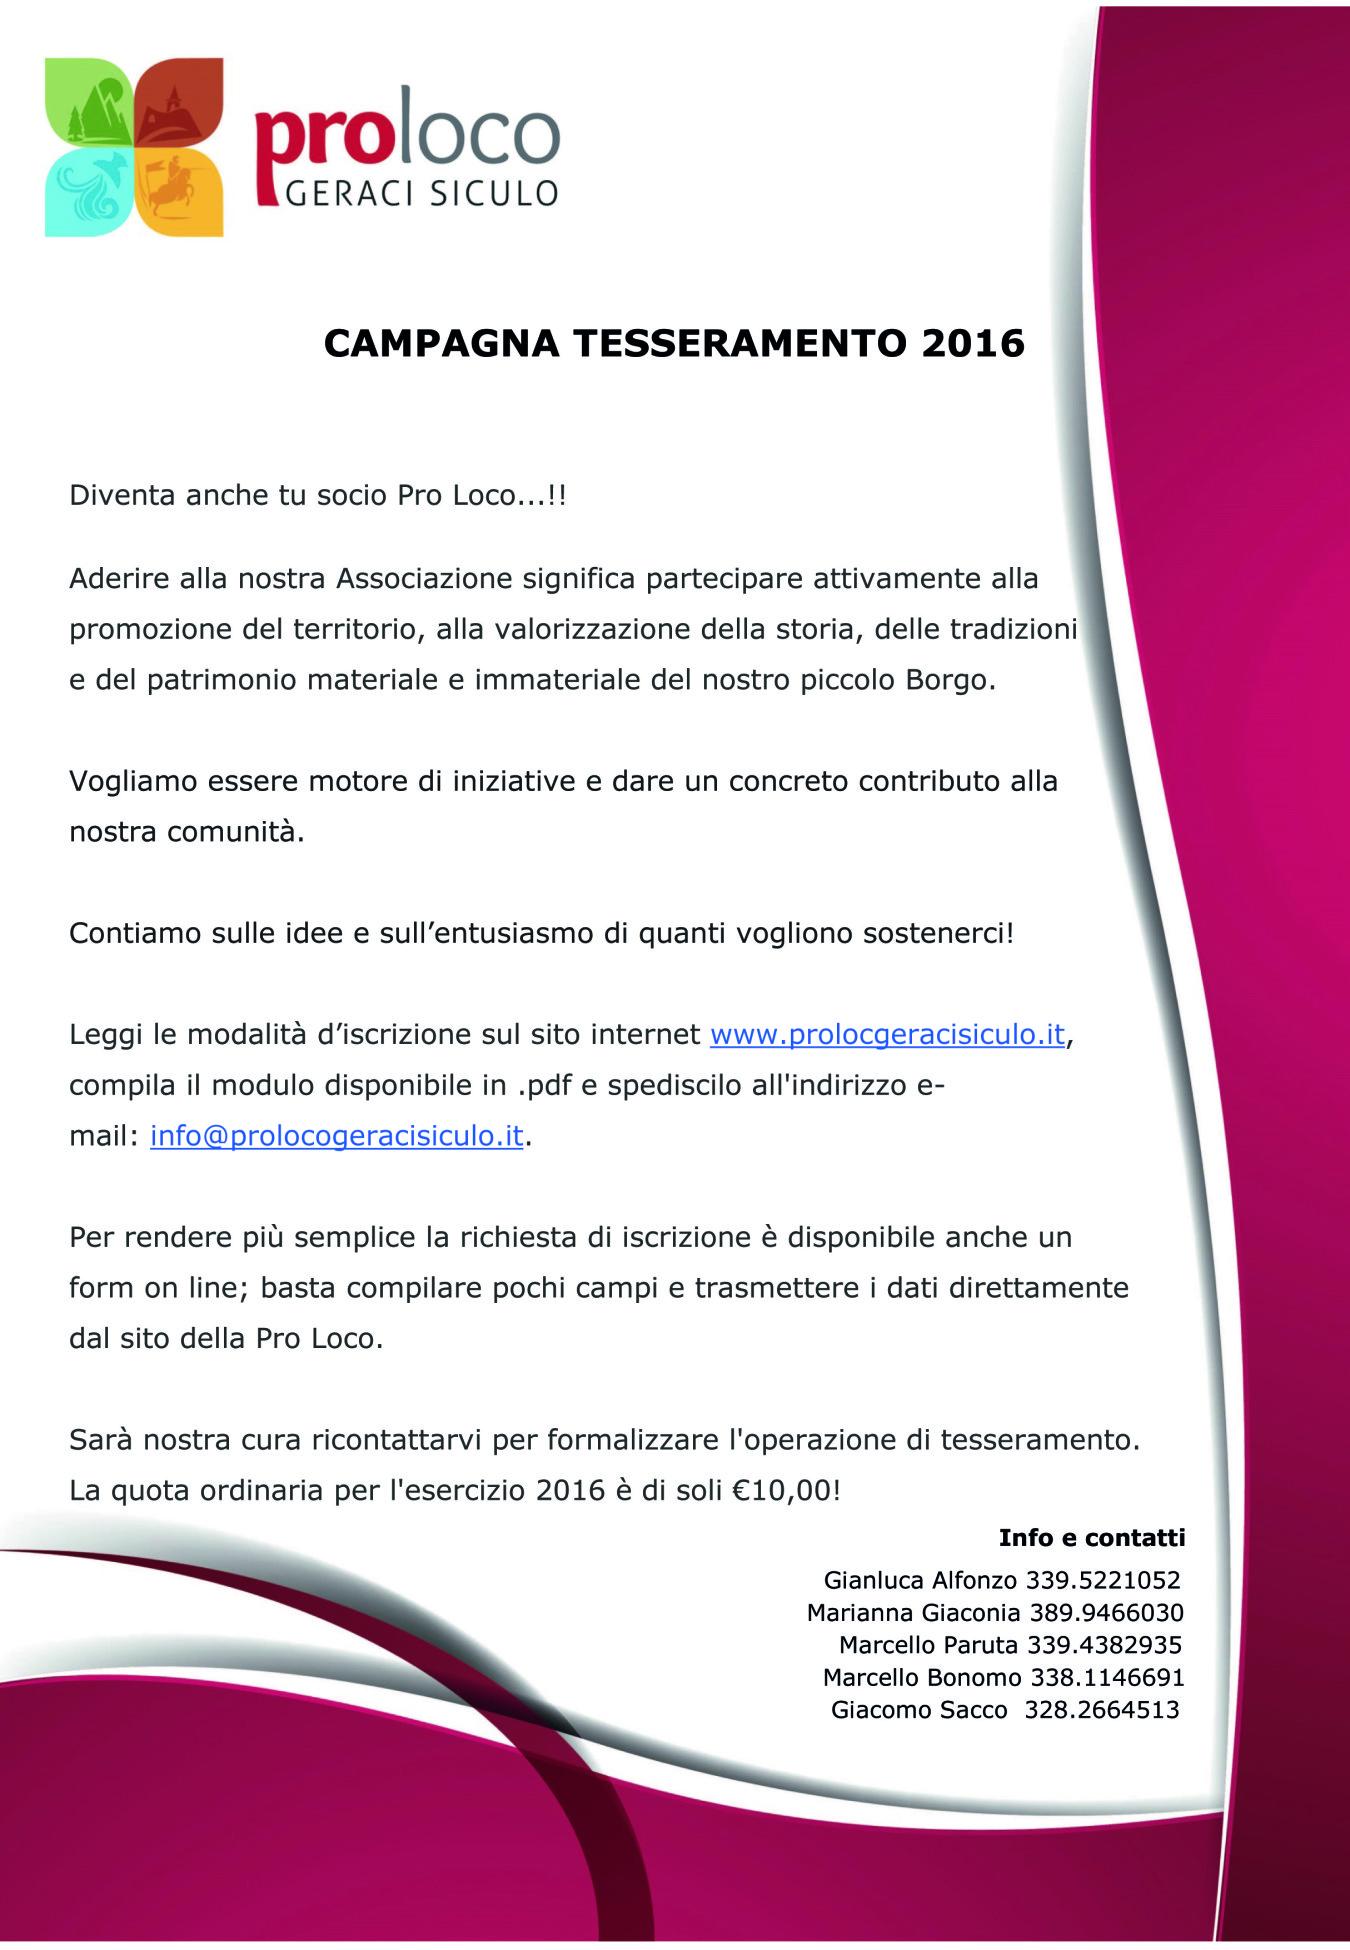 CAMPAGNA TESSERAMENTO 2016-01